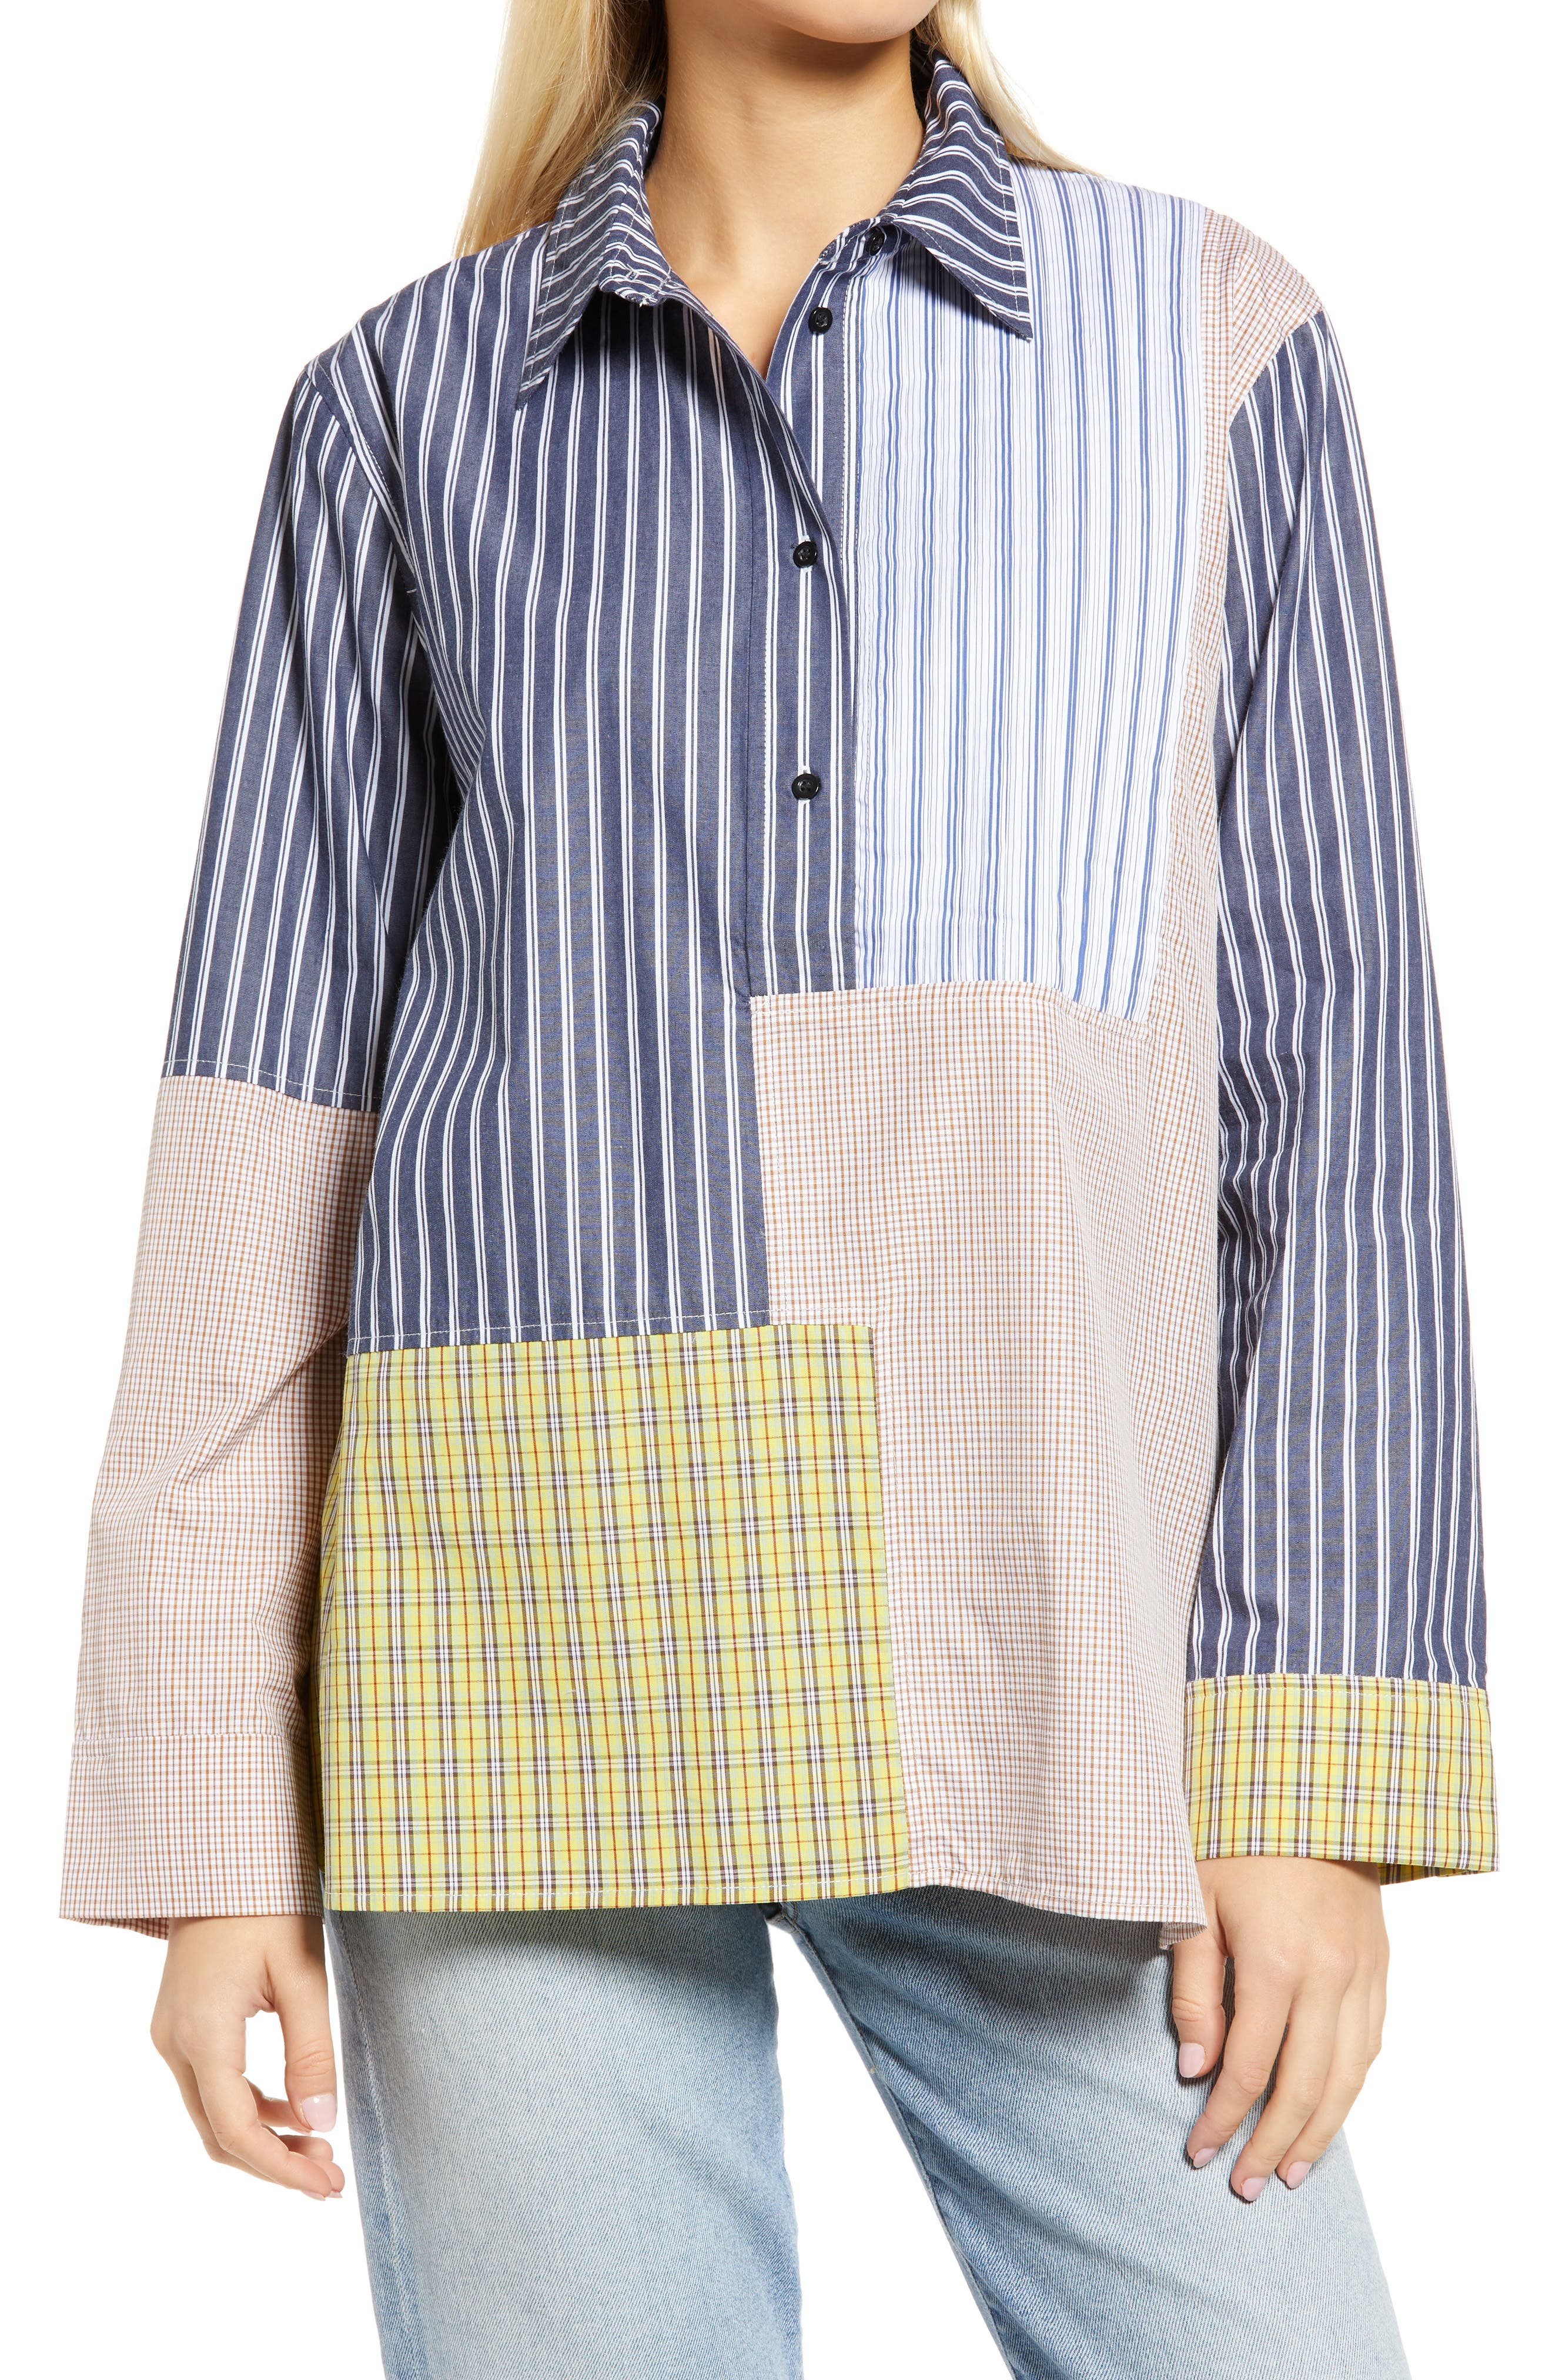 Randy Mix Print Long Sleeve Shirt